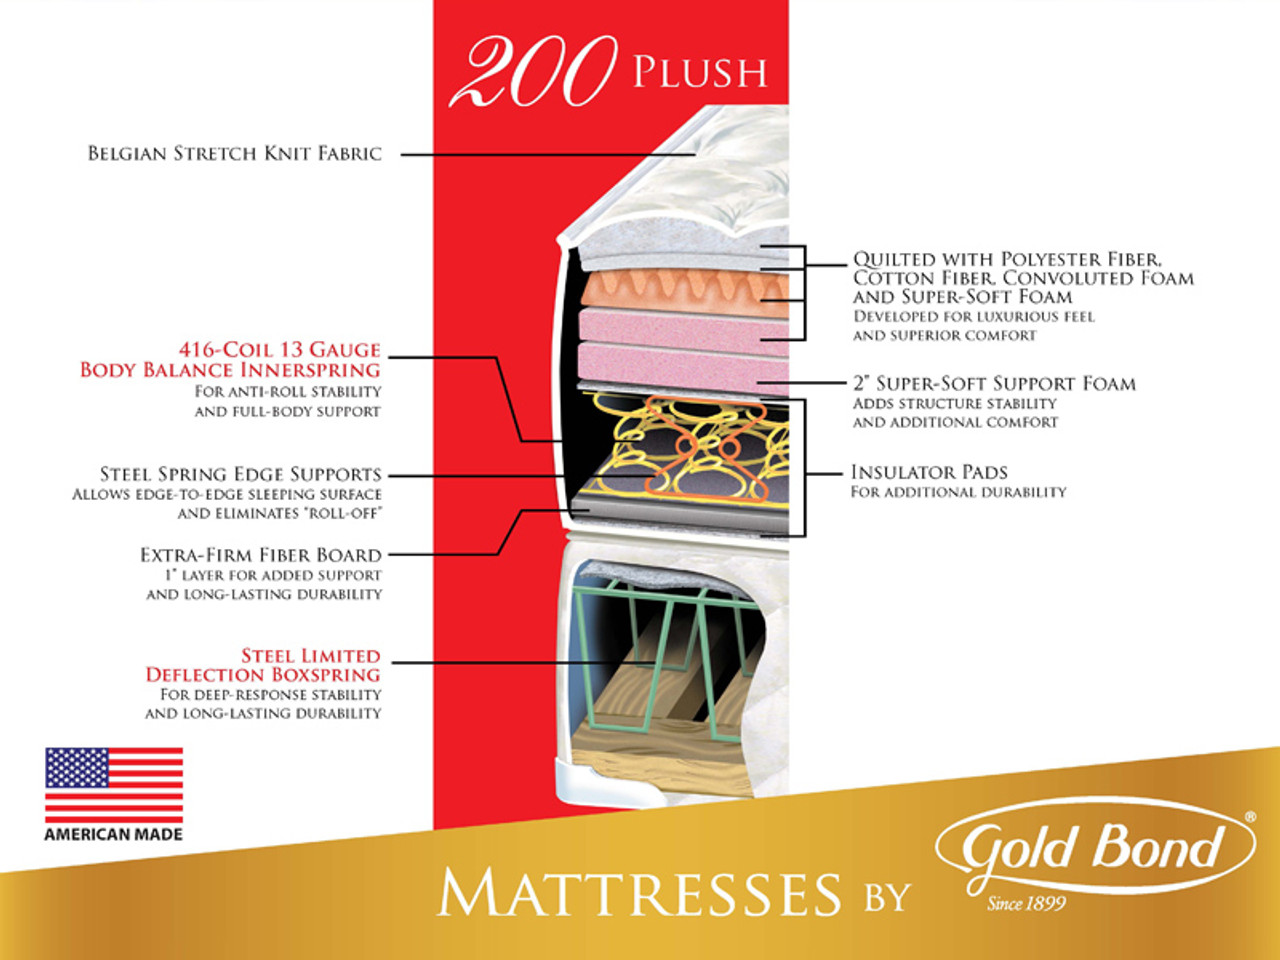 Gold Bond Comfort Collection 200 Plush Mattress Bedroom Source